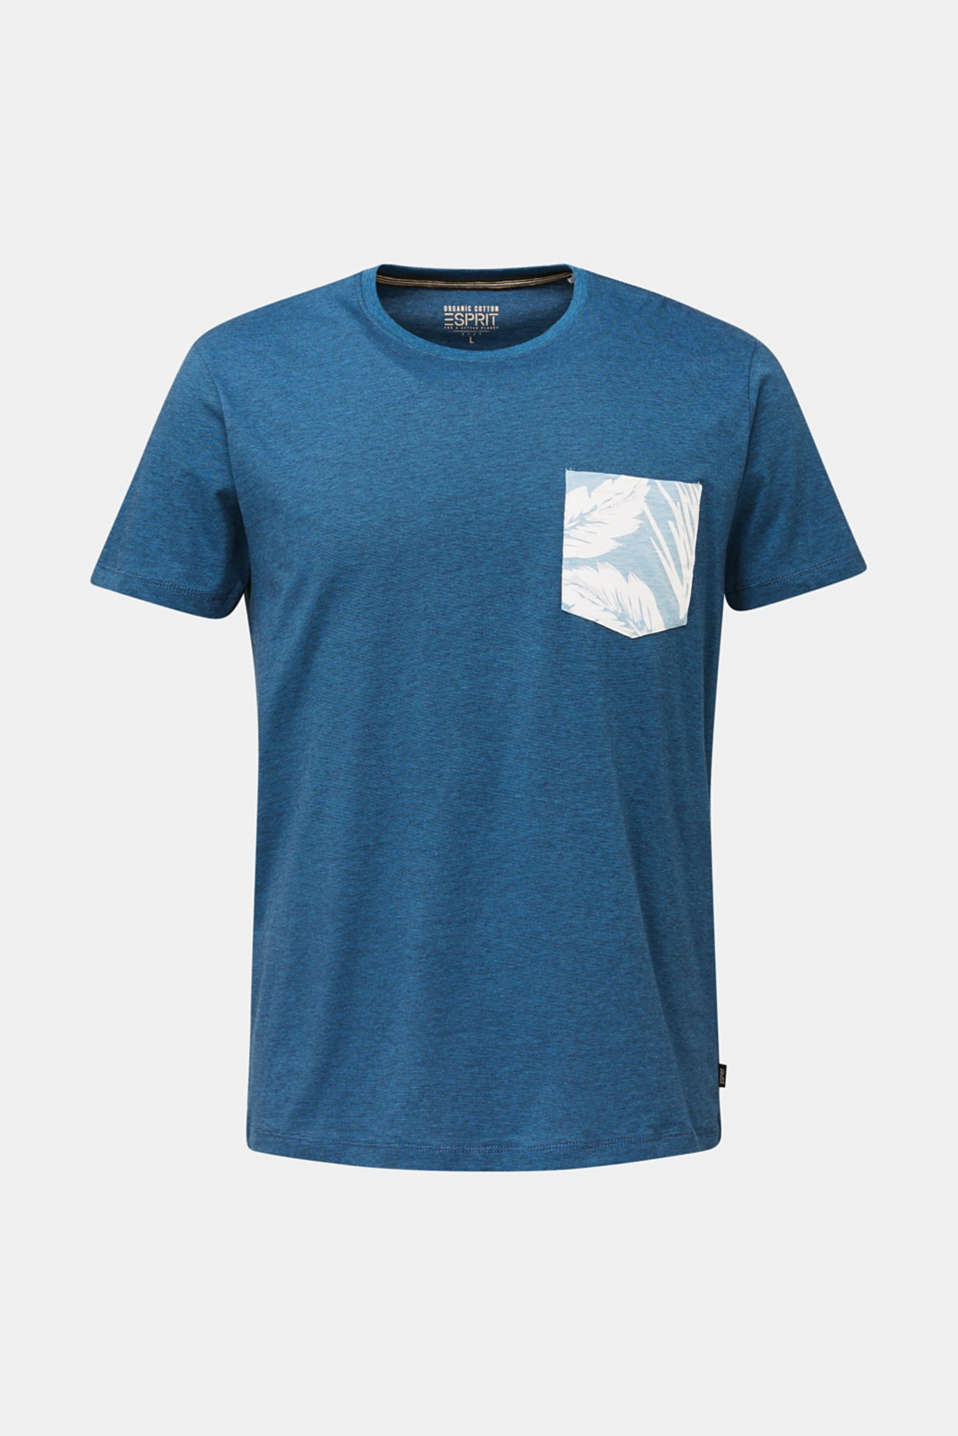 Jersey top, 100% organic cotton, PETROL BLUE 3, detail image number 7